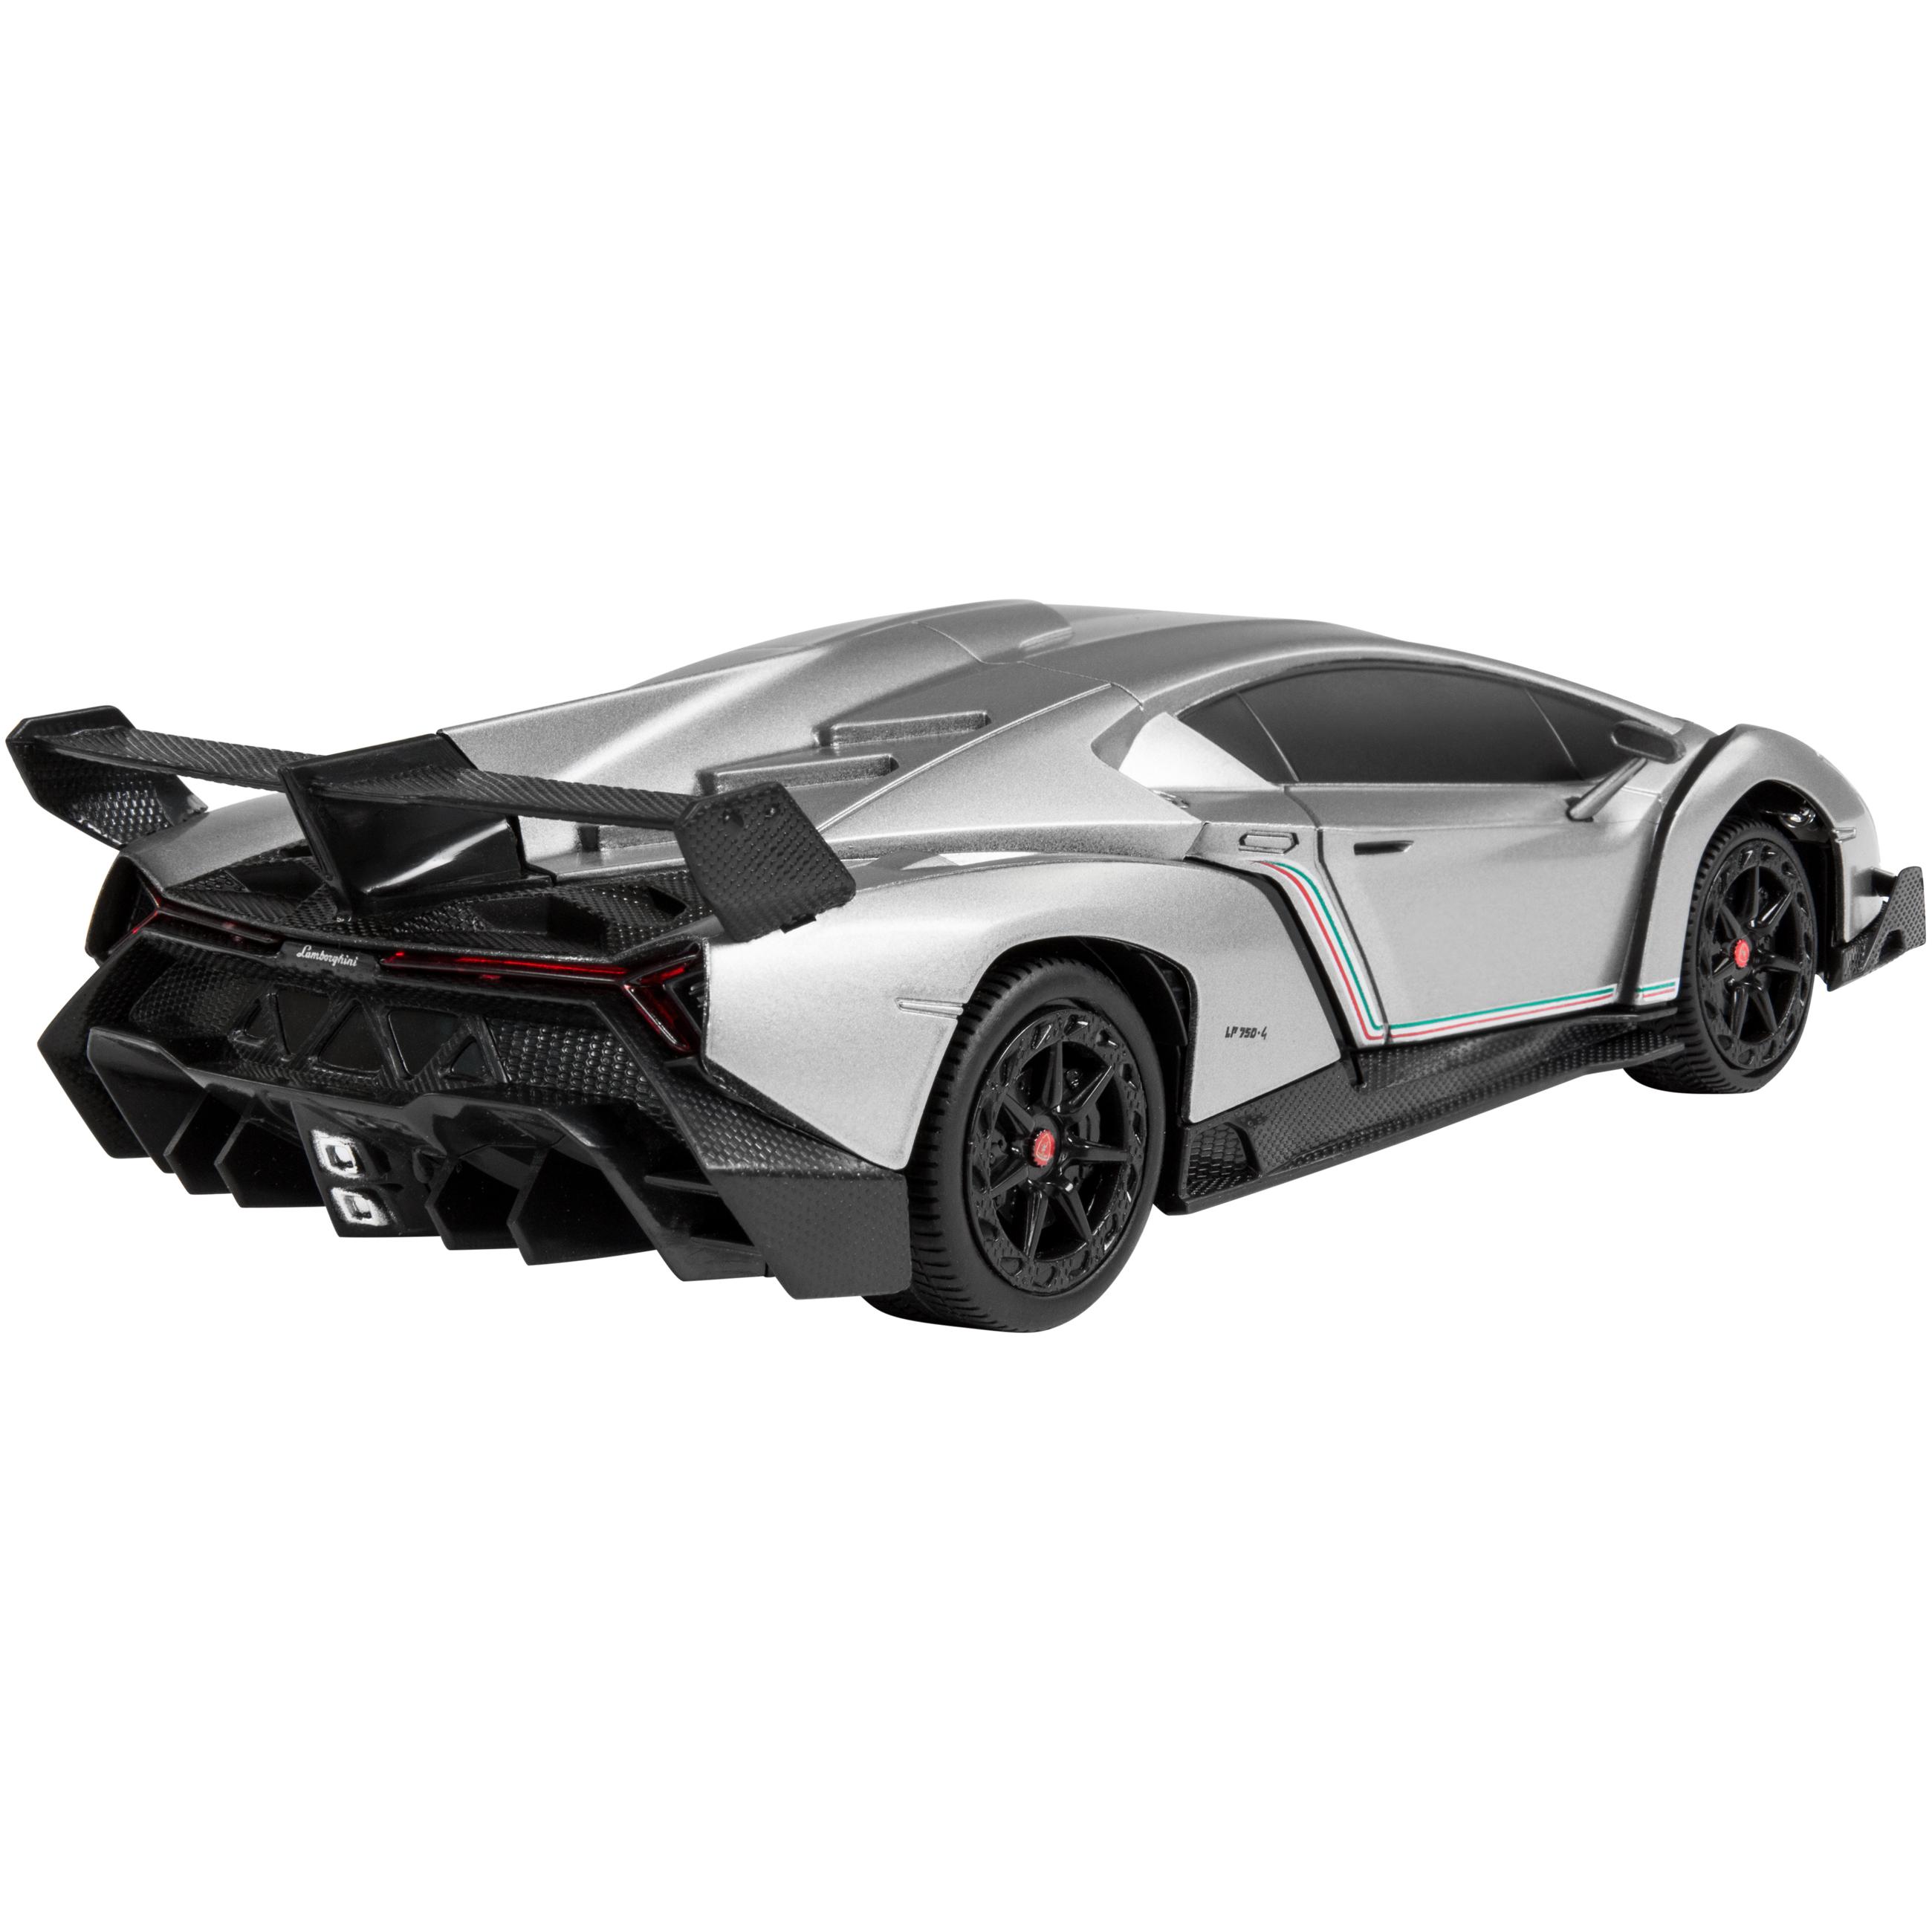 BCP-1-24-Kids-RC-Lamborghini-Veneno-Racing-Car-Toy-w-Lights-Shock-Suspension thumbnail 25